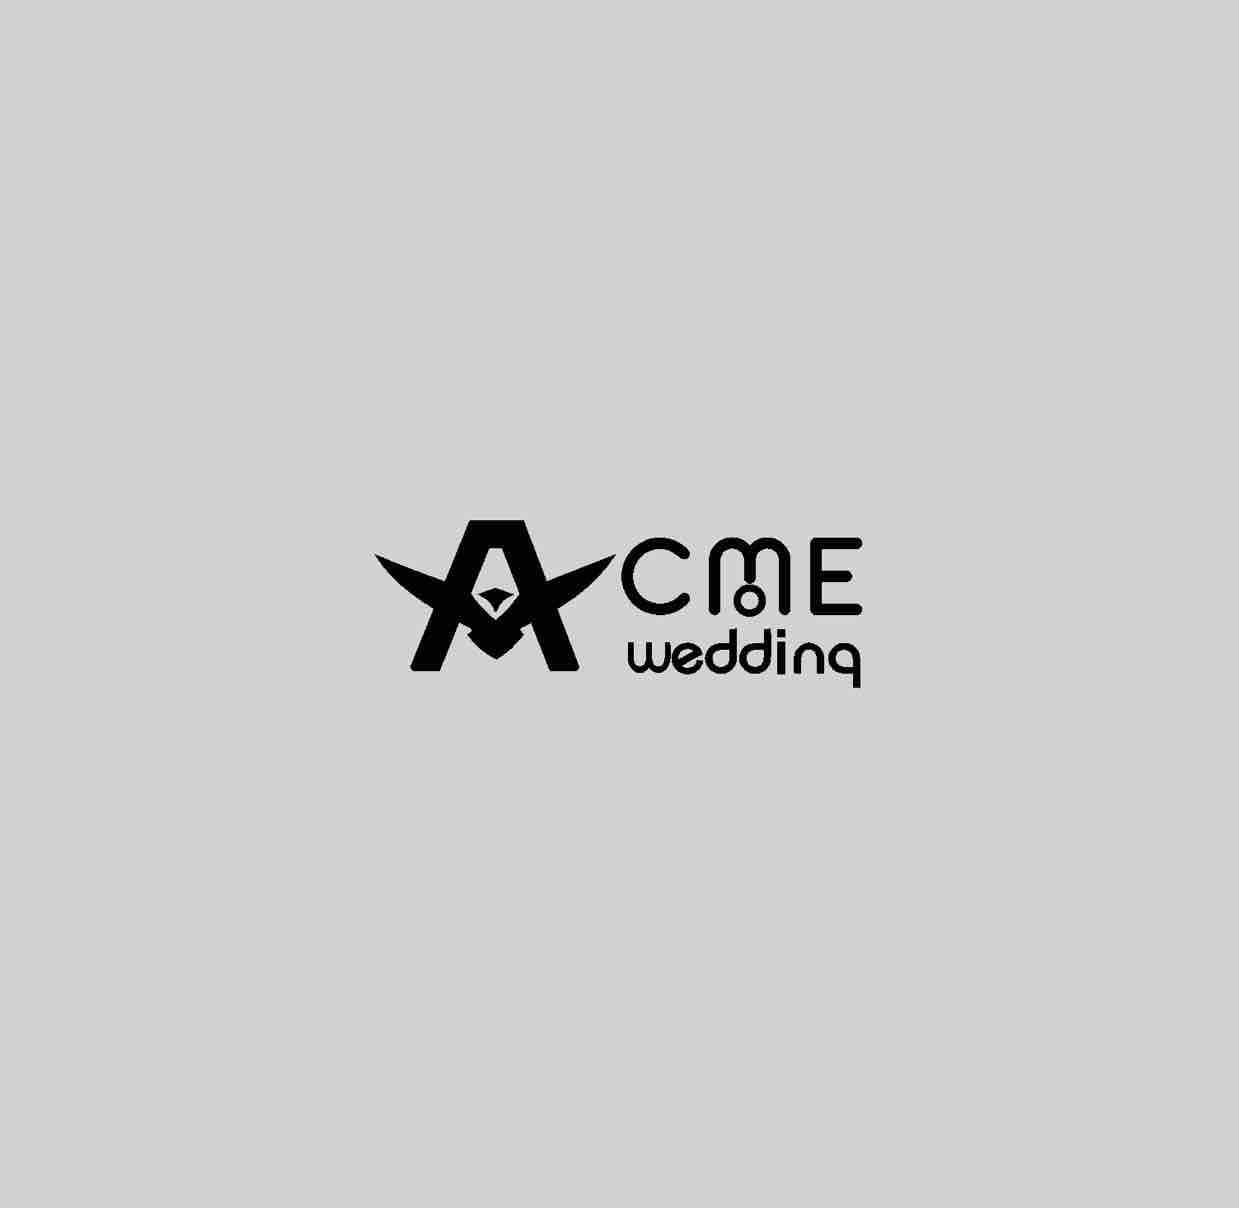 ACME沙龙